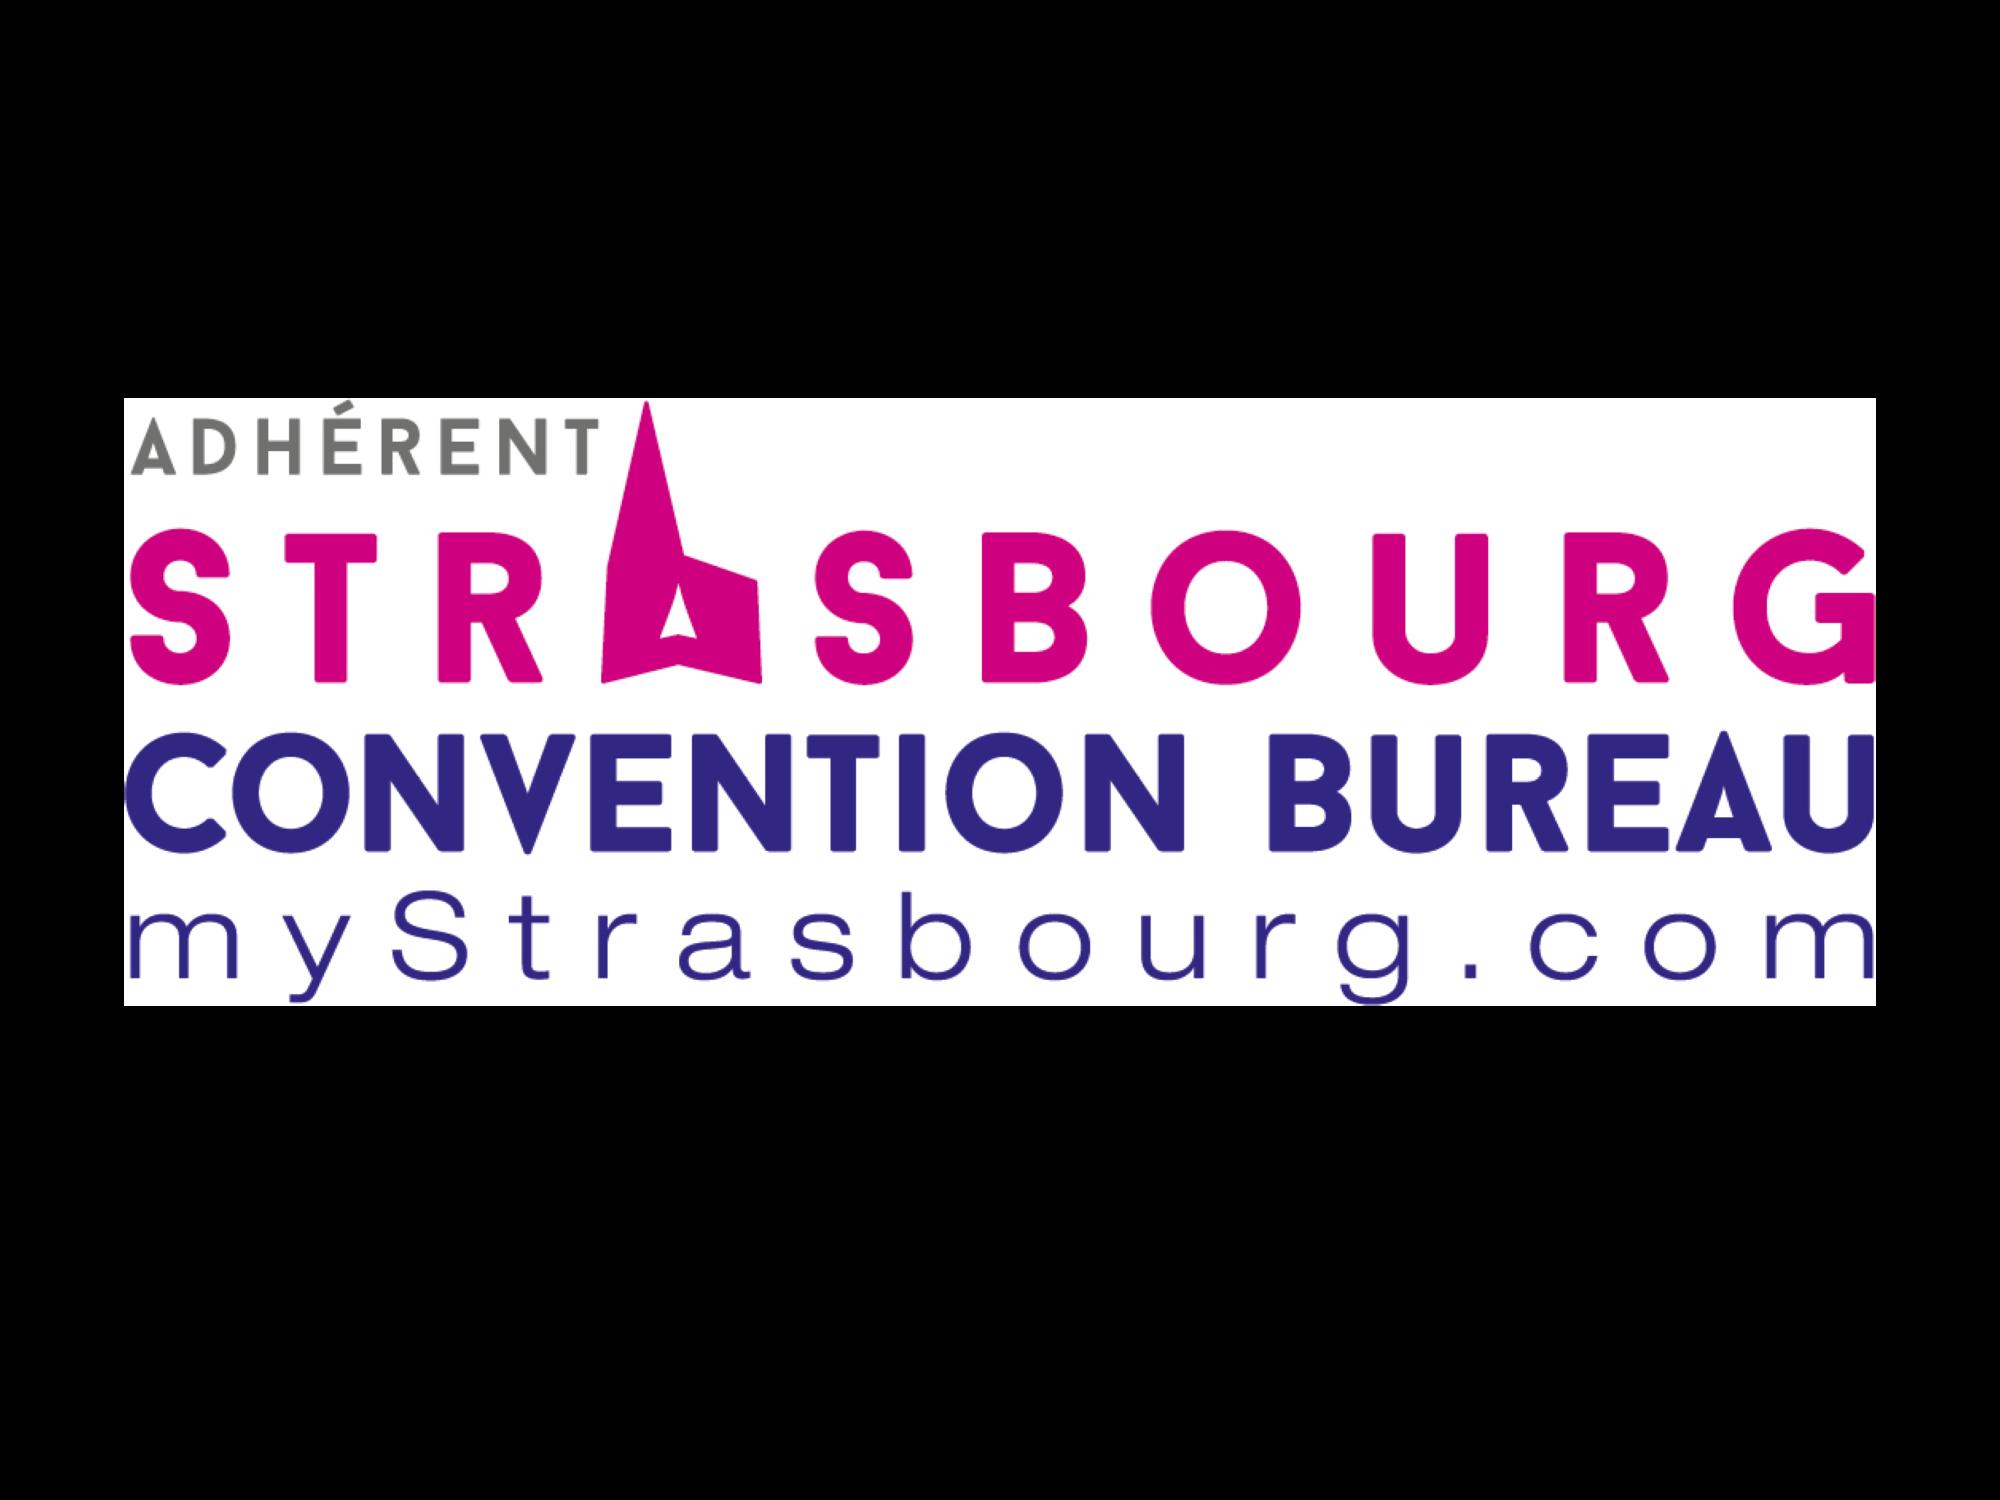 Strasbourg convention bureau